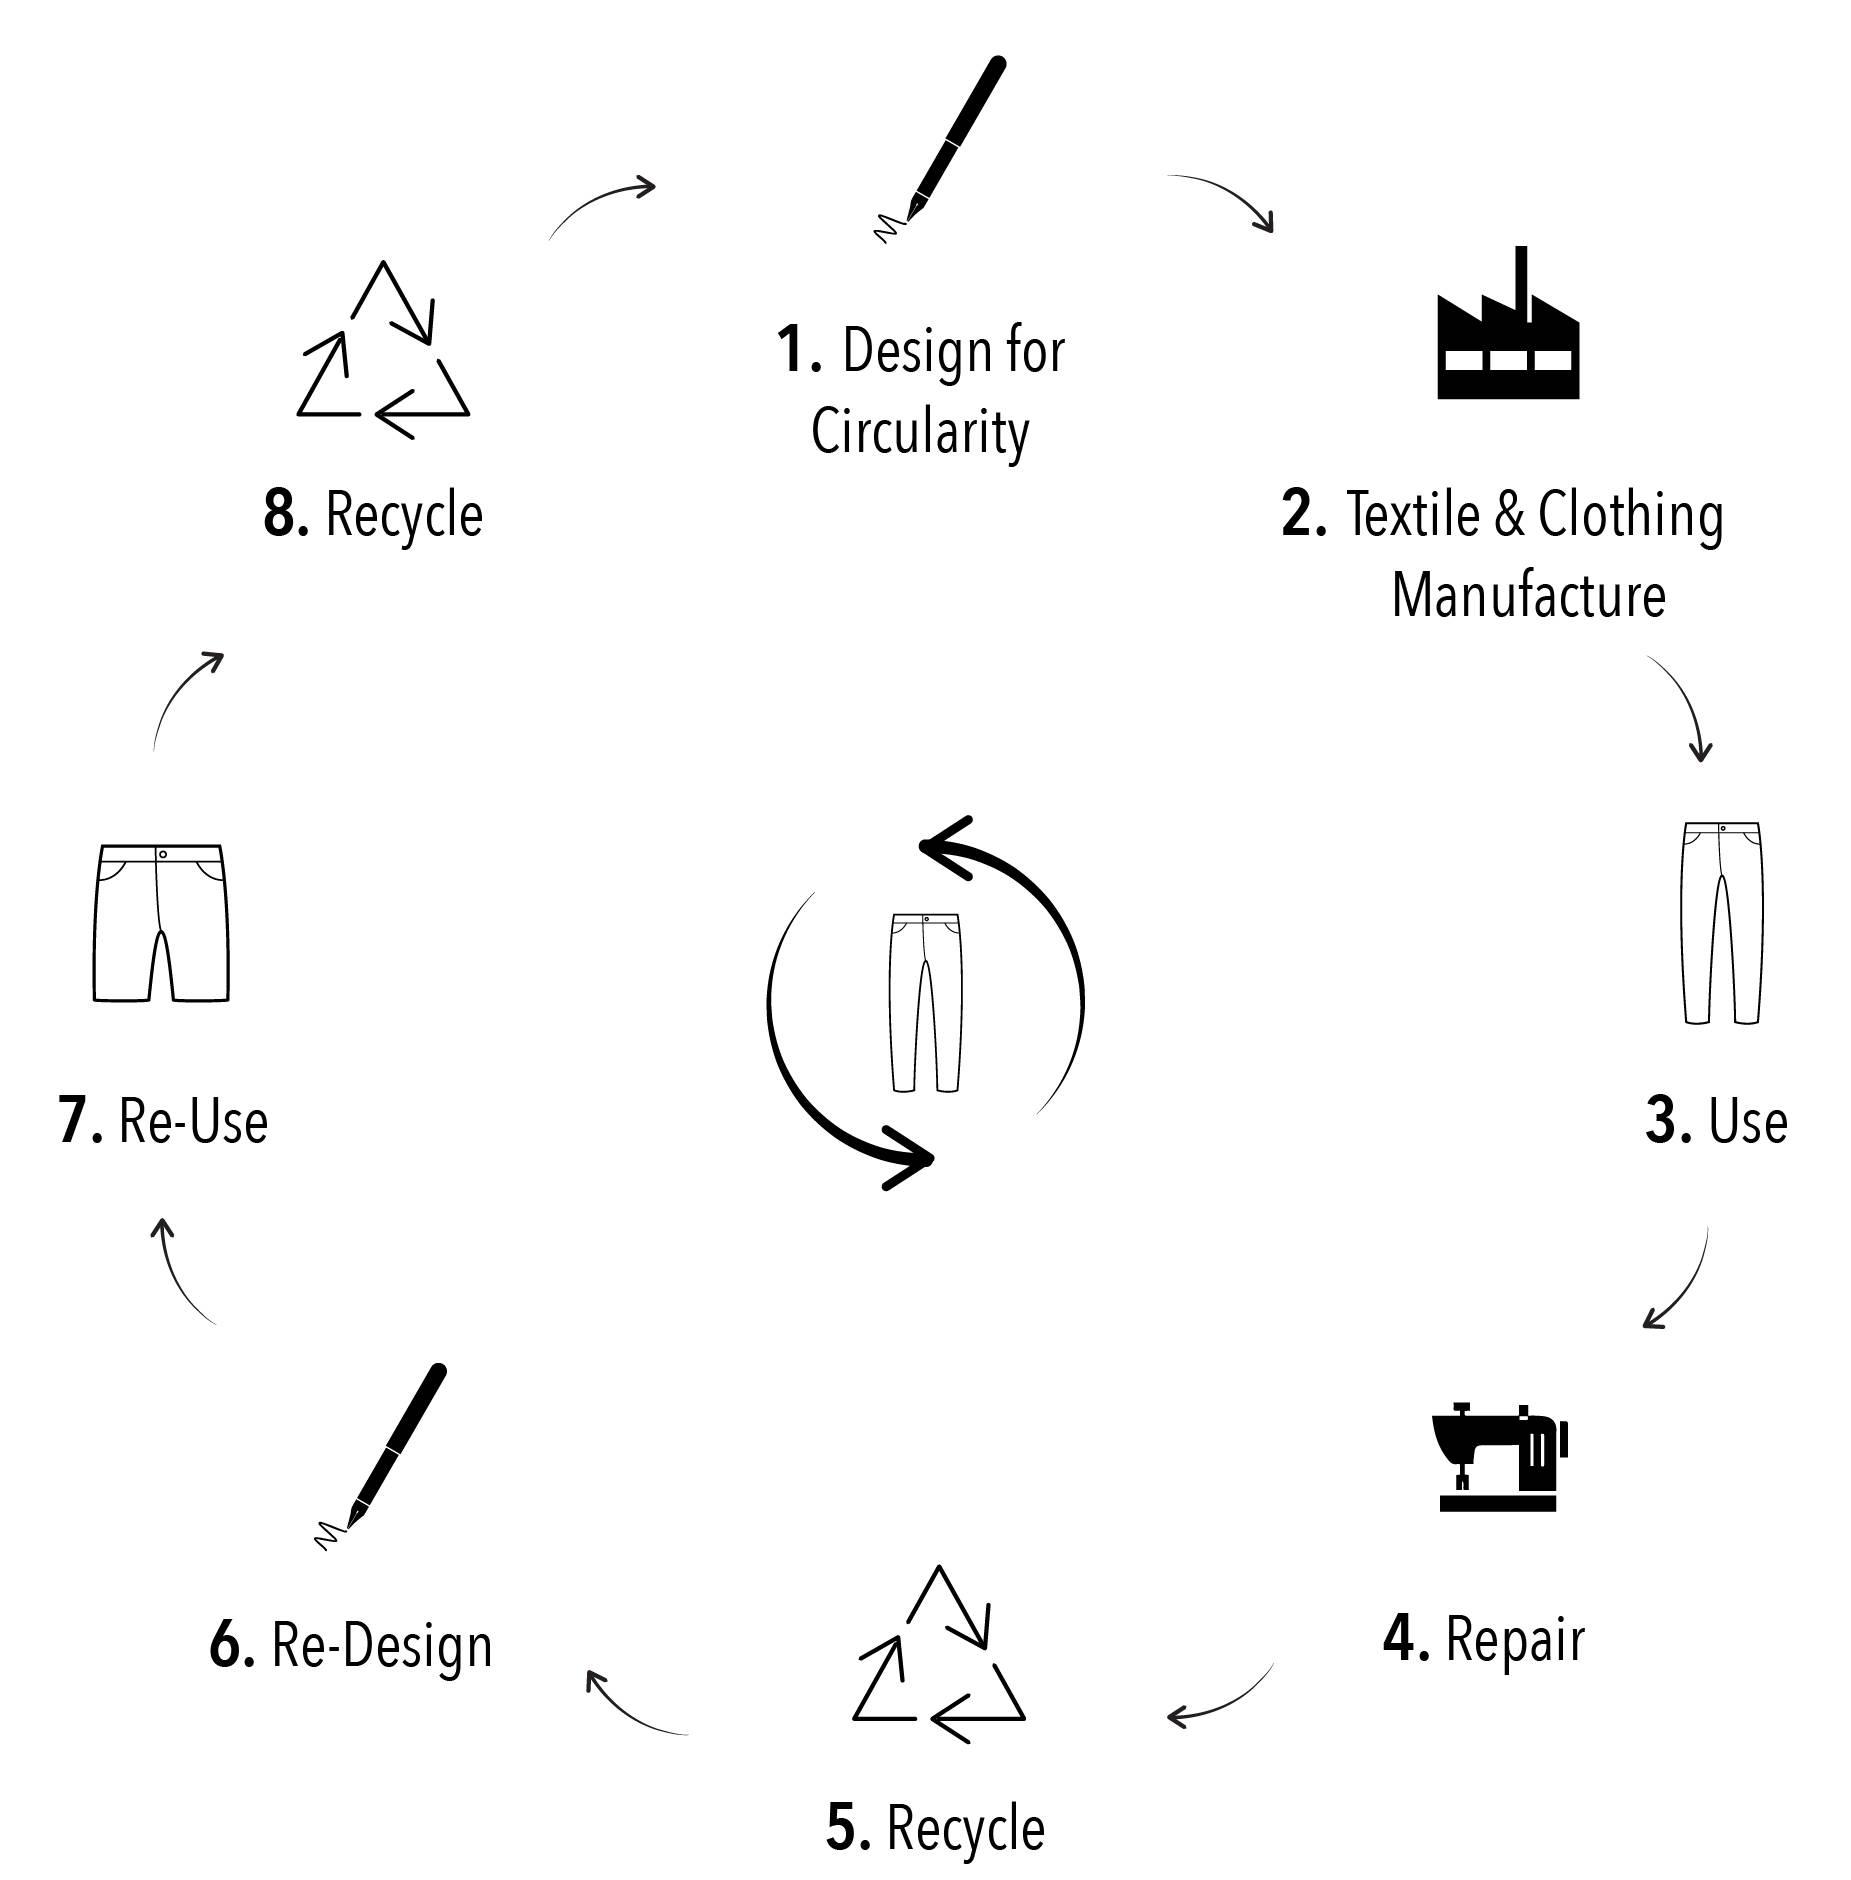 a diagram showing how circular fashion works